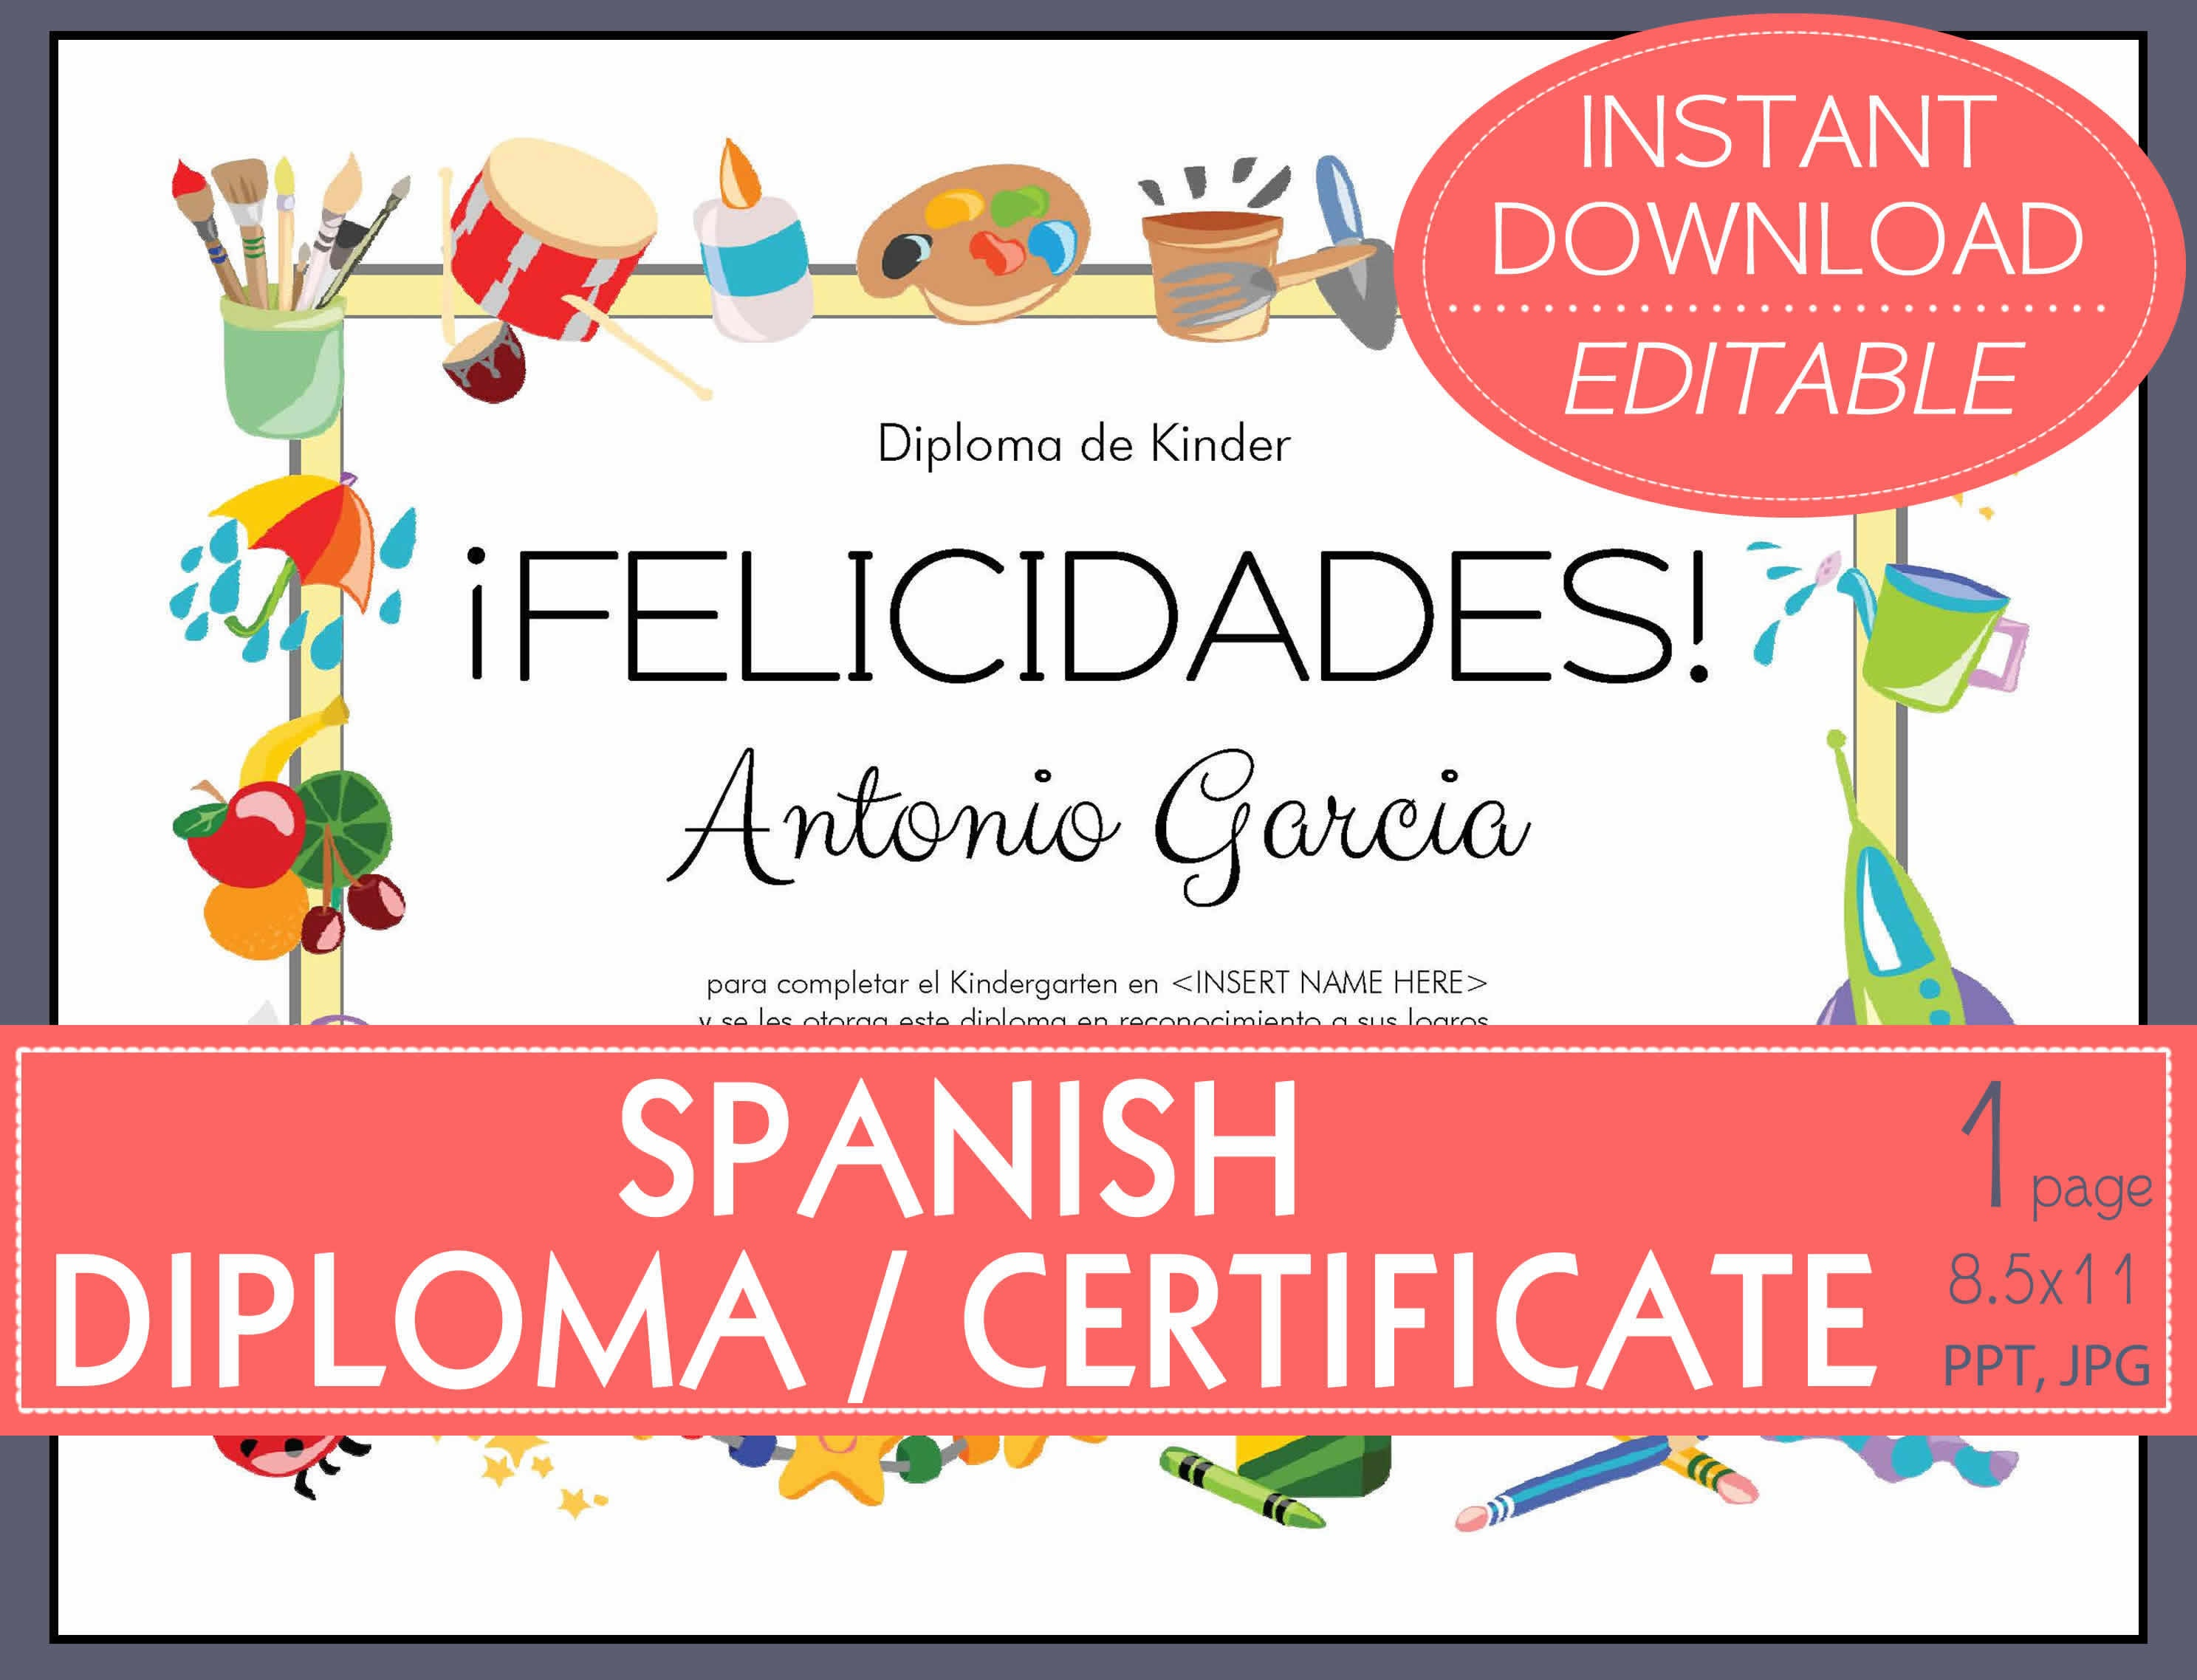 Editable Spanish Certificate Diploma For Graduation Etsy